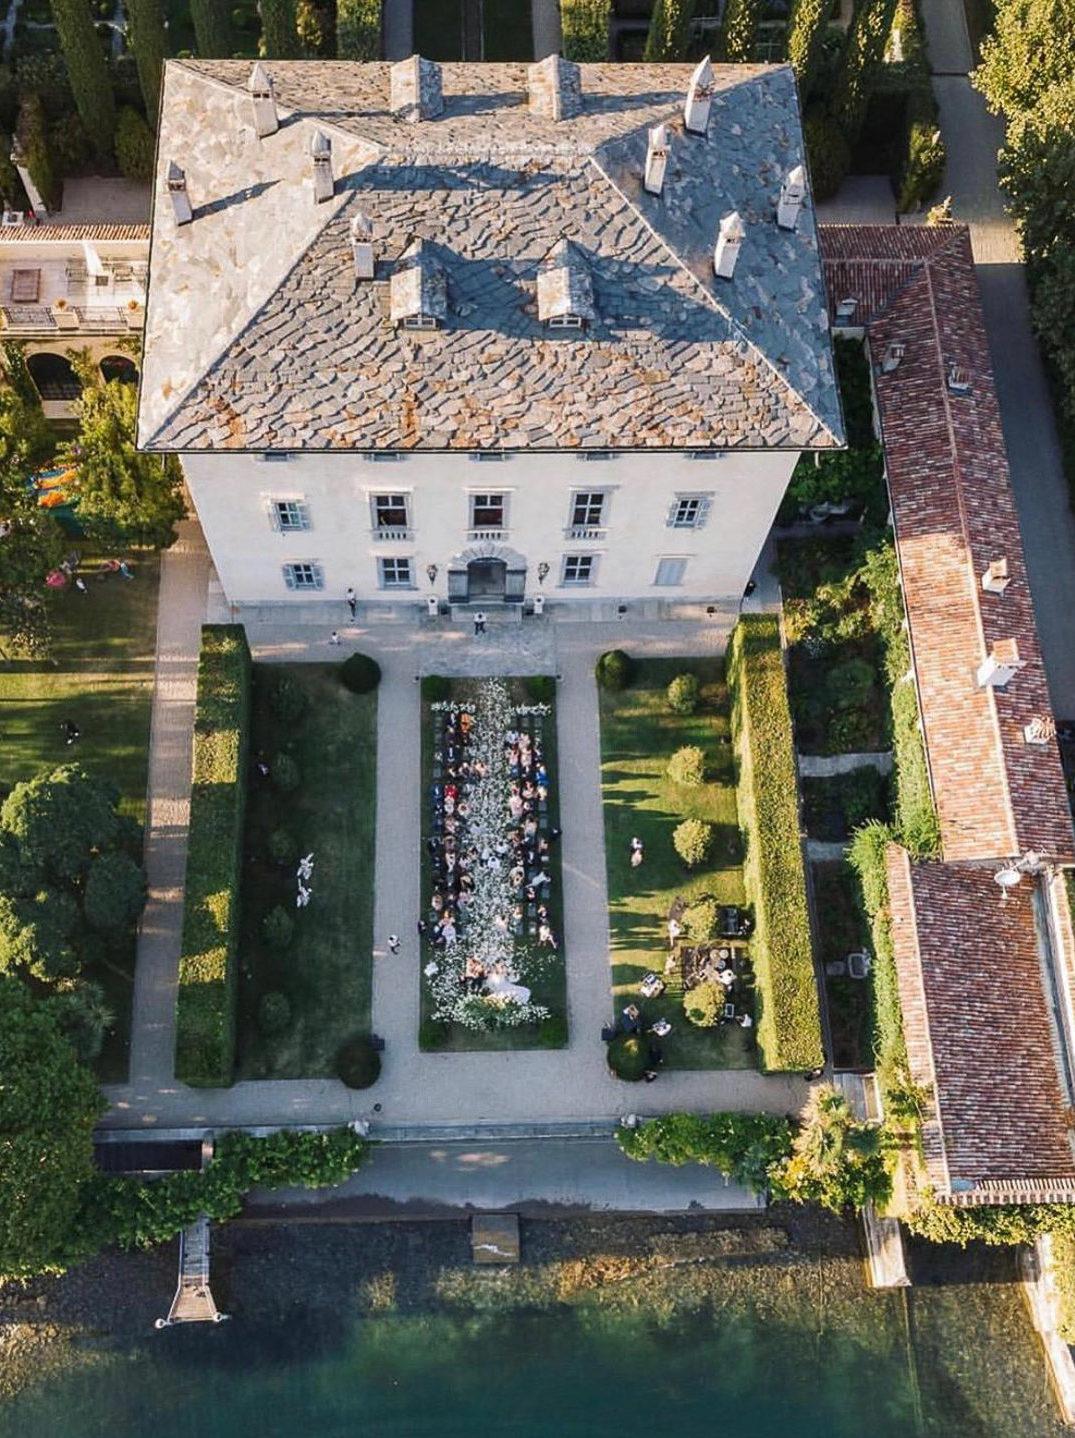 Villa Balbiano luxury property Lake Como Italy exclusive private rent rental best wedding venue events ceremony place vast park garden best view elopment engagement services